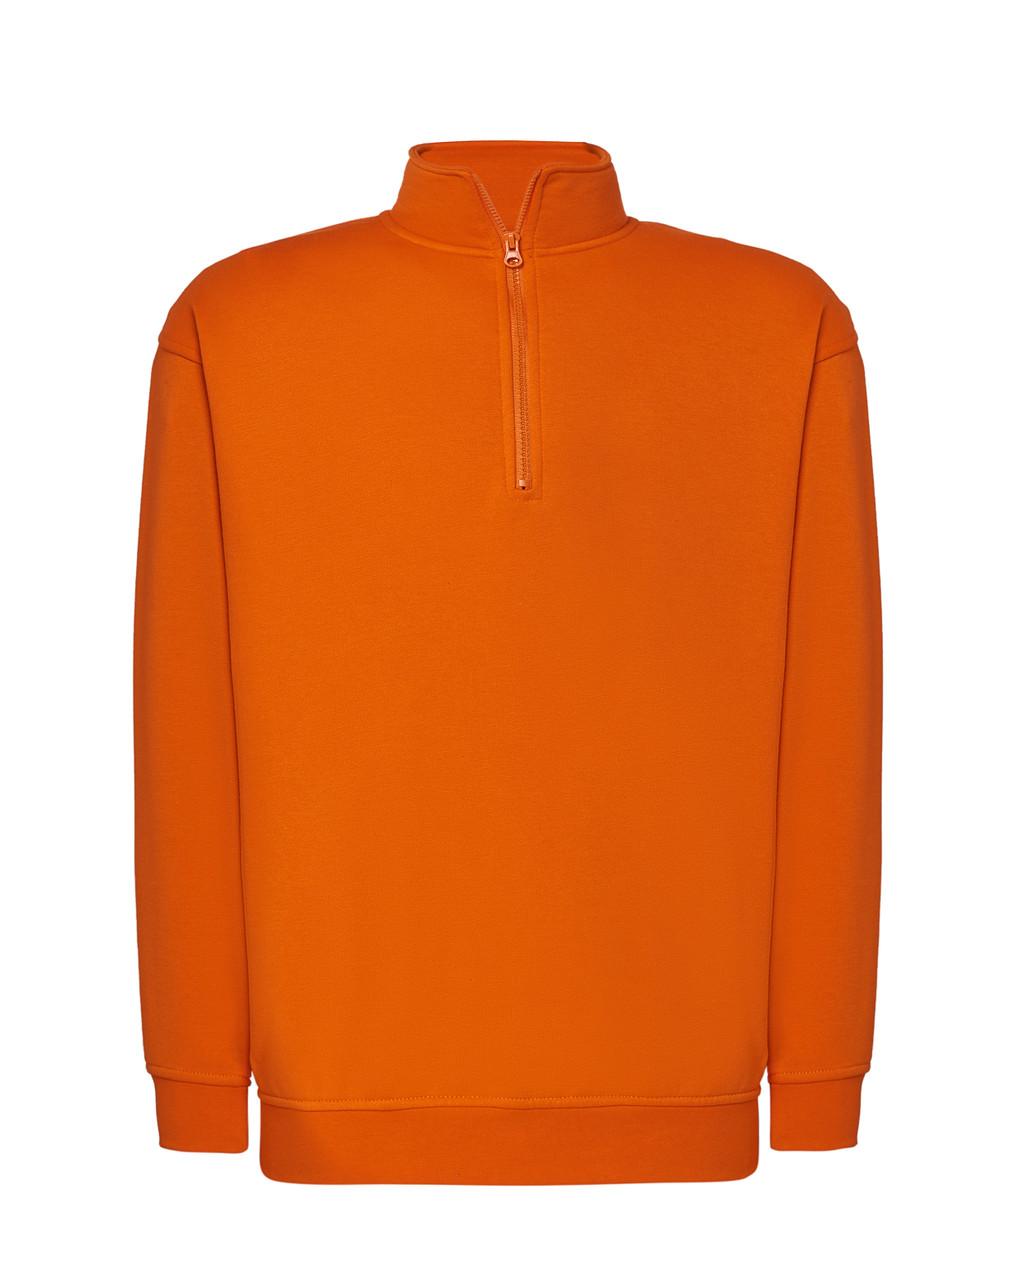 Мужская толстовка JHK HALF ZIP SWEATSHIRT цвет оранжевый (OR)